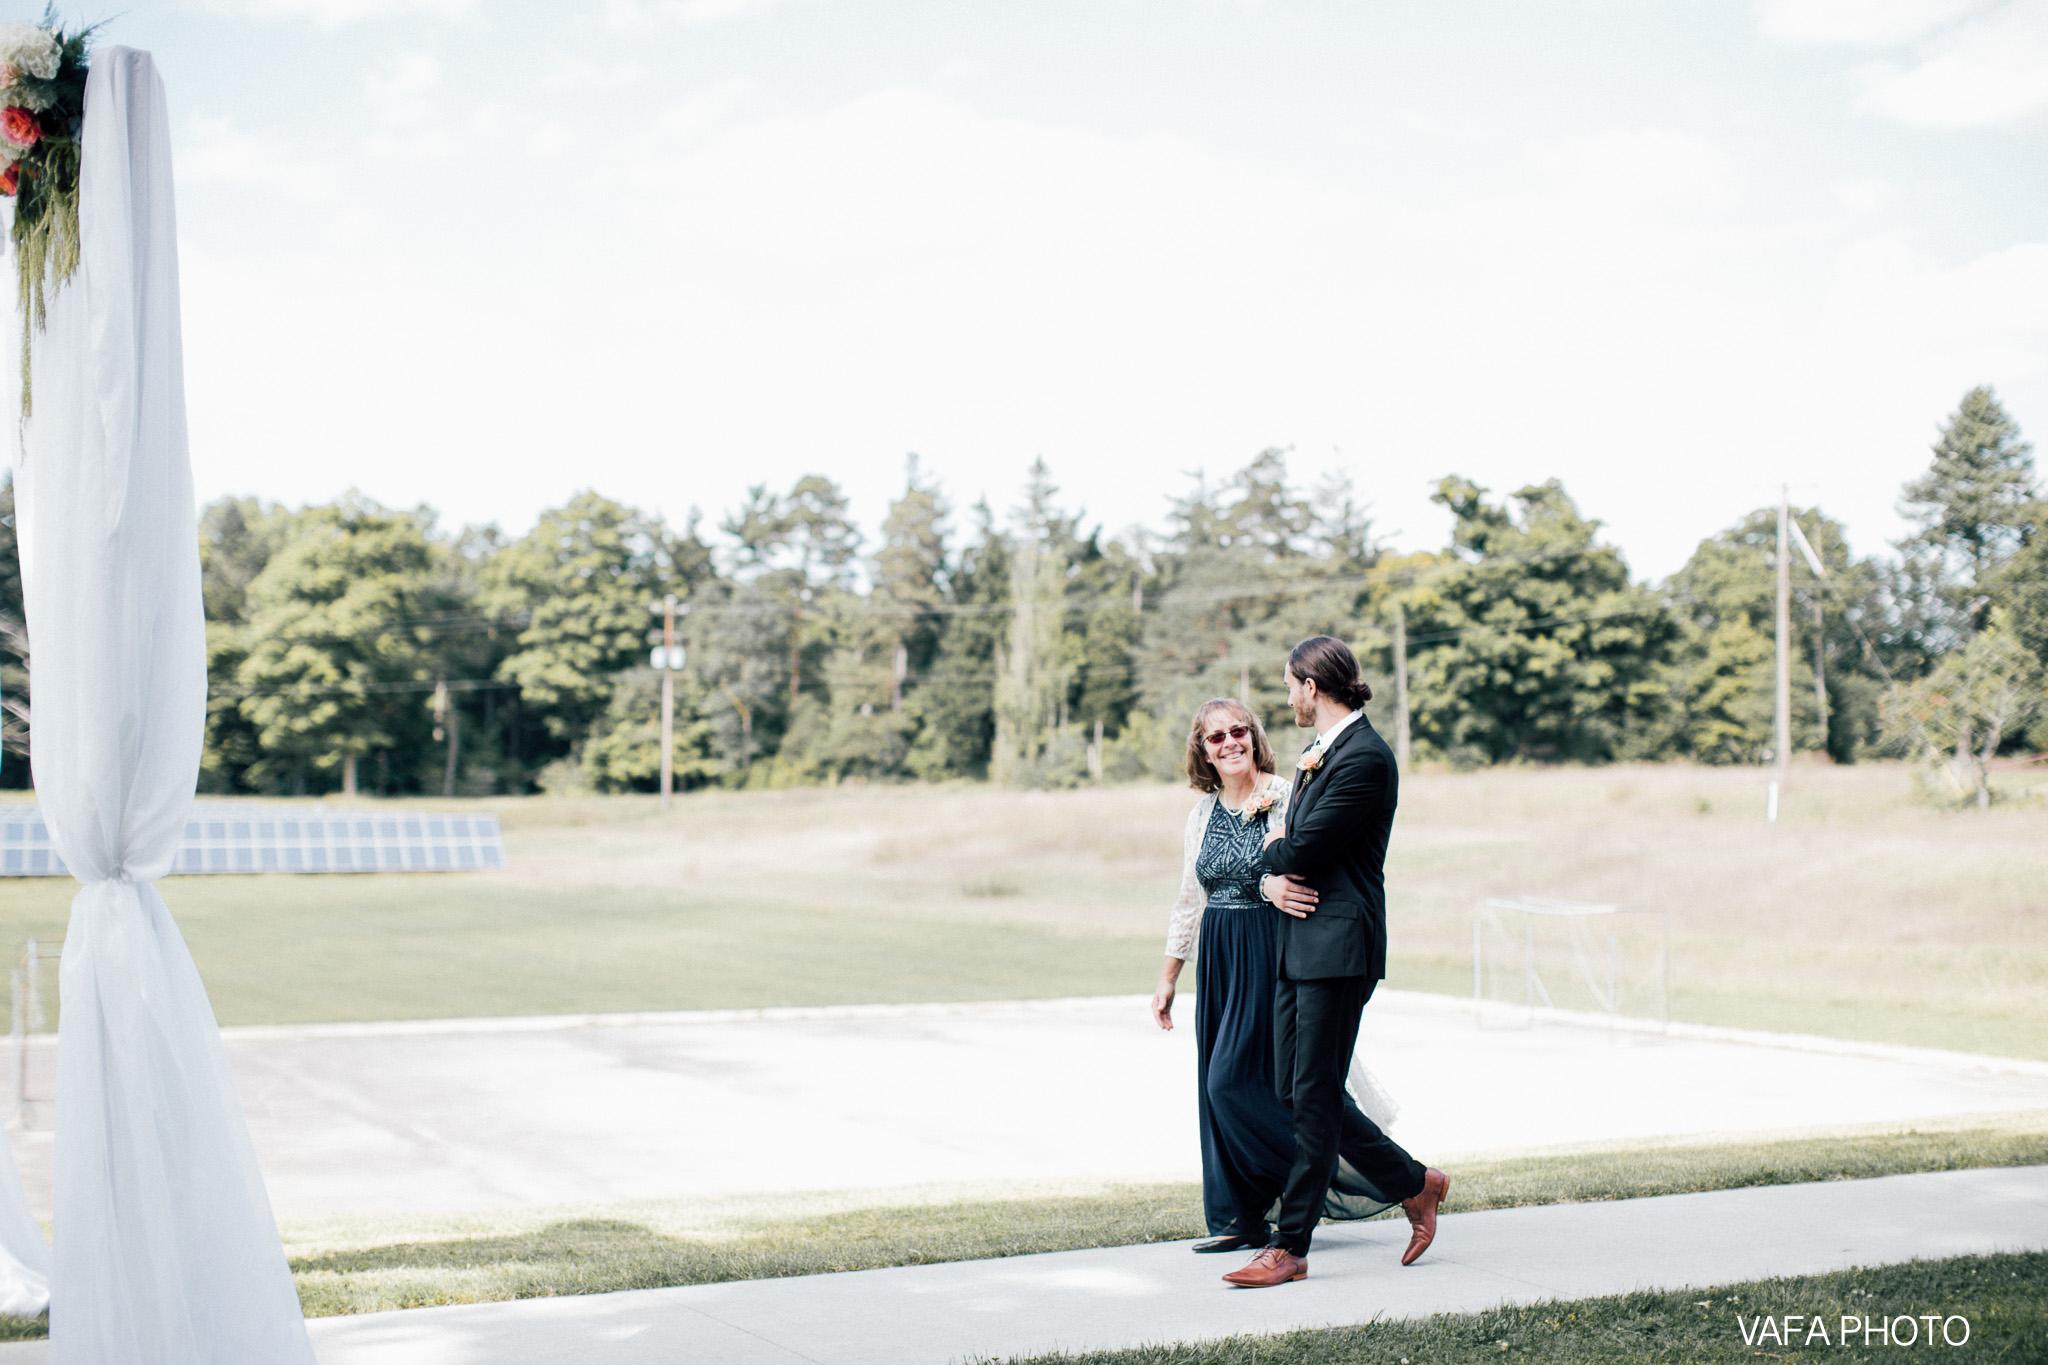 The-Felt-Estate-Wedding-Kailie-David-Vafa-Photo-258.jpg